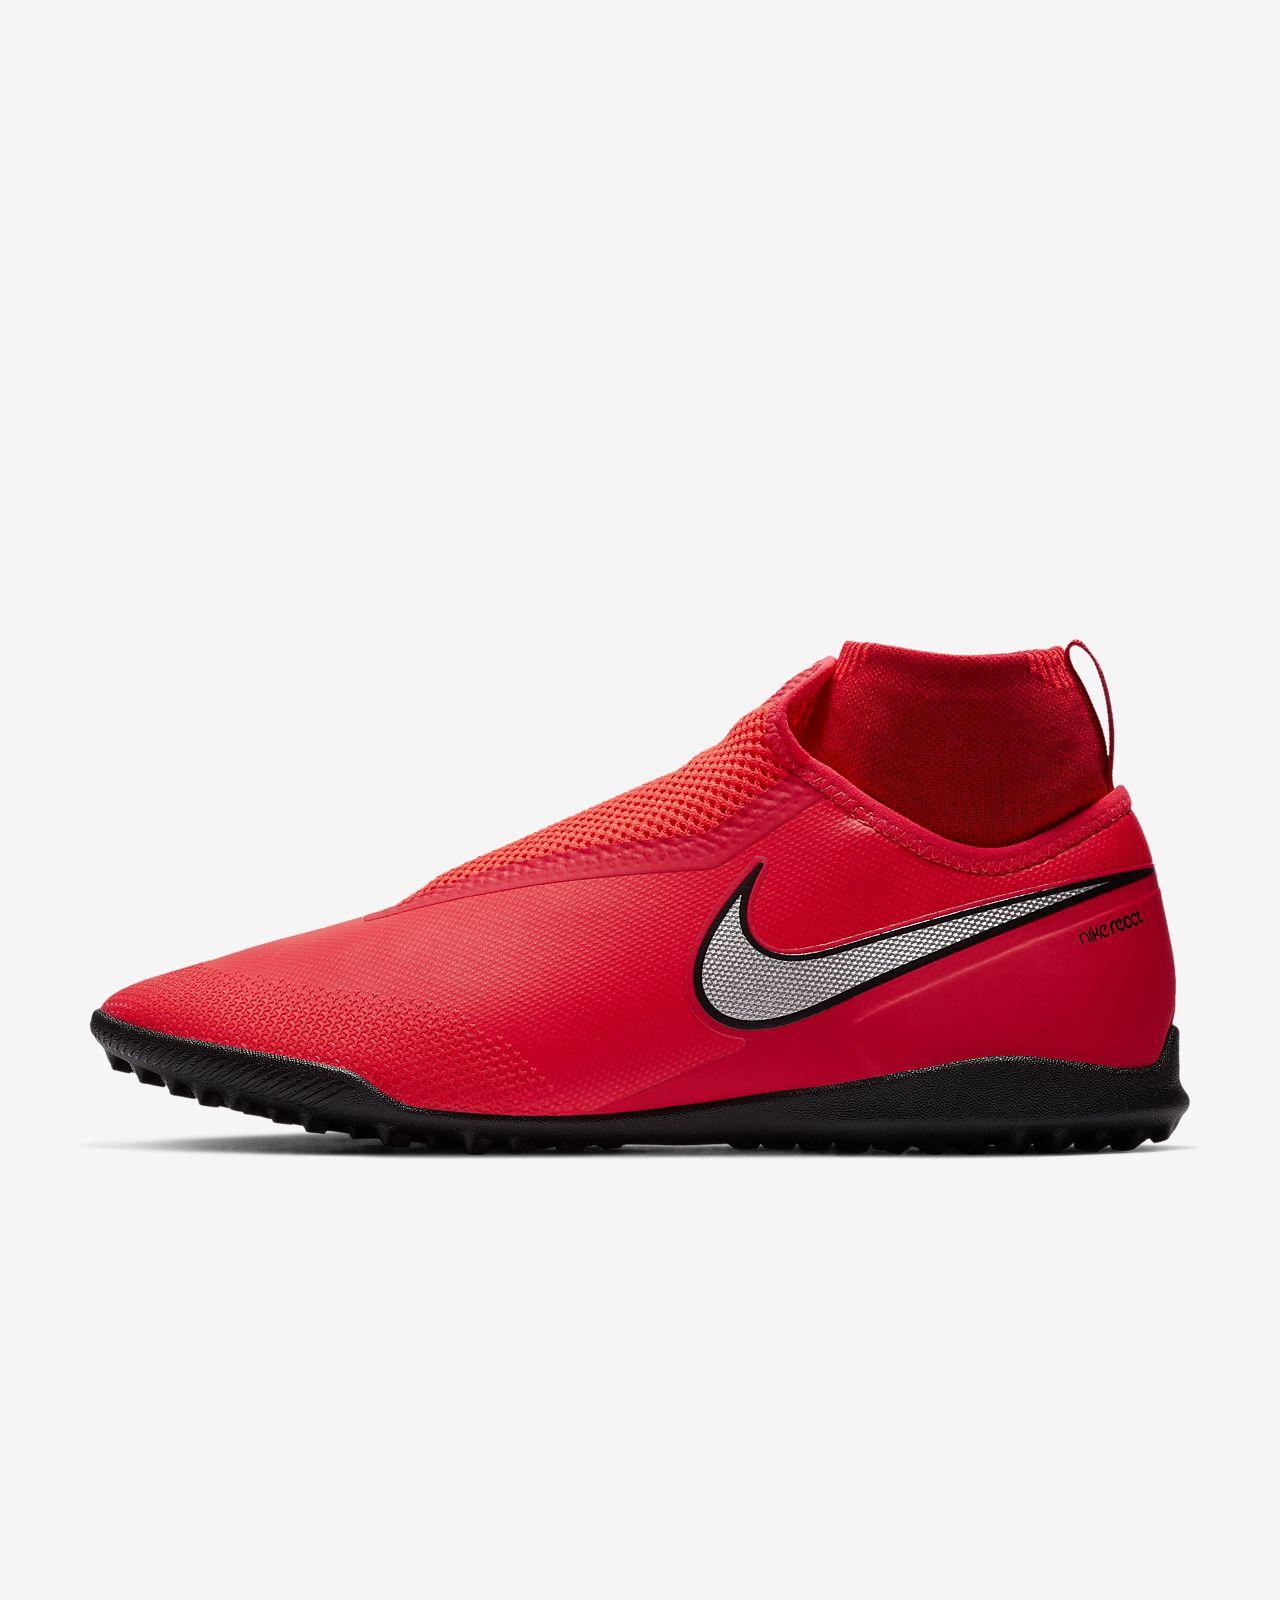 new arrival f5014 5e399 Turf Football Shoe. Nike React PhantomVSN Pro Dynamic Fit Game Over TF